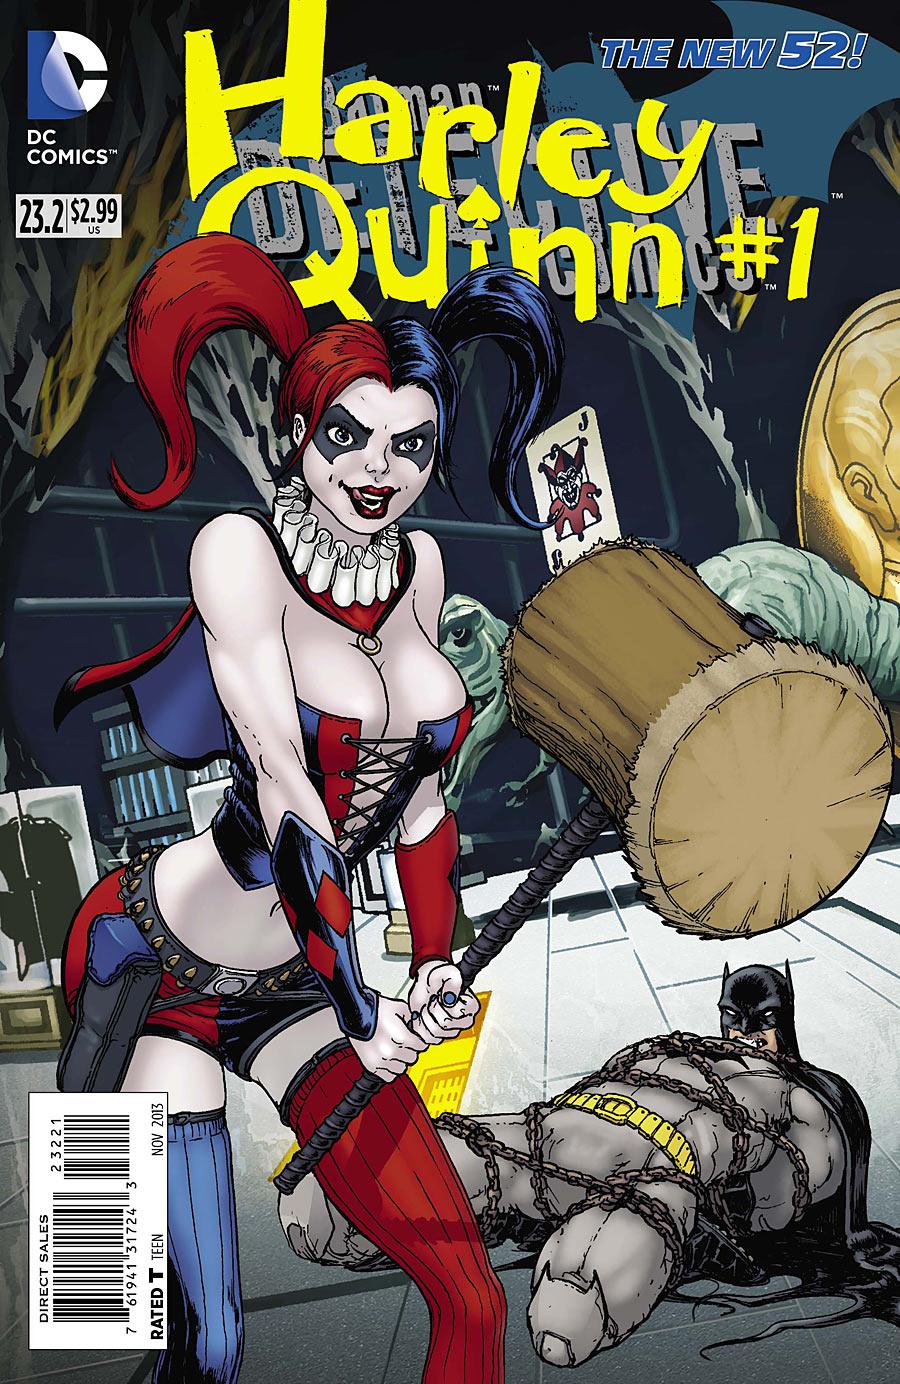 DETECTIVE COMICS #23.2: HARLEY QUINN